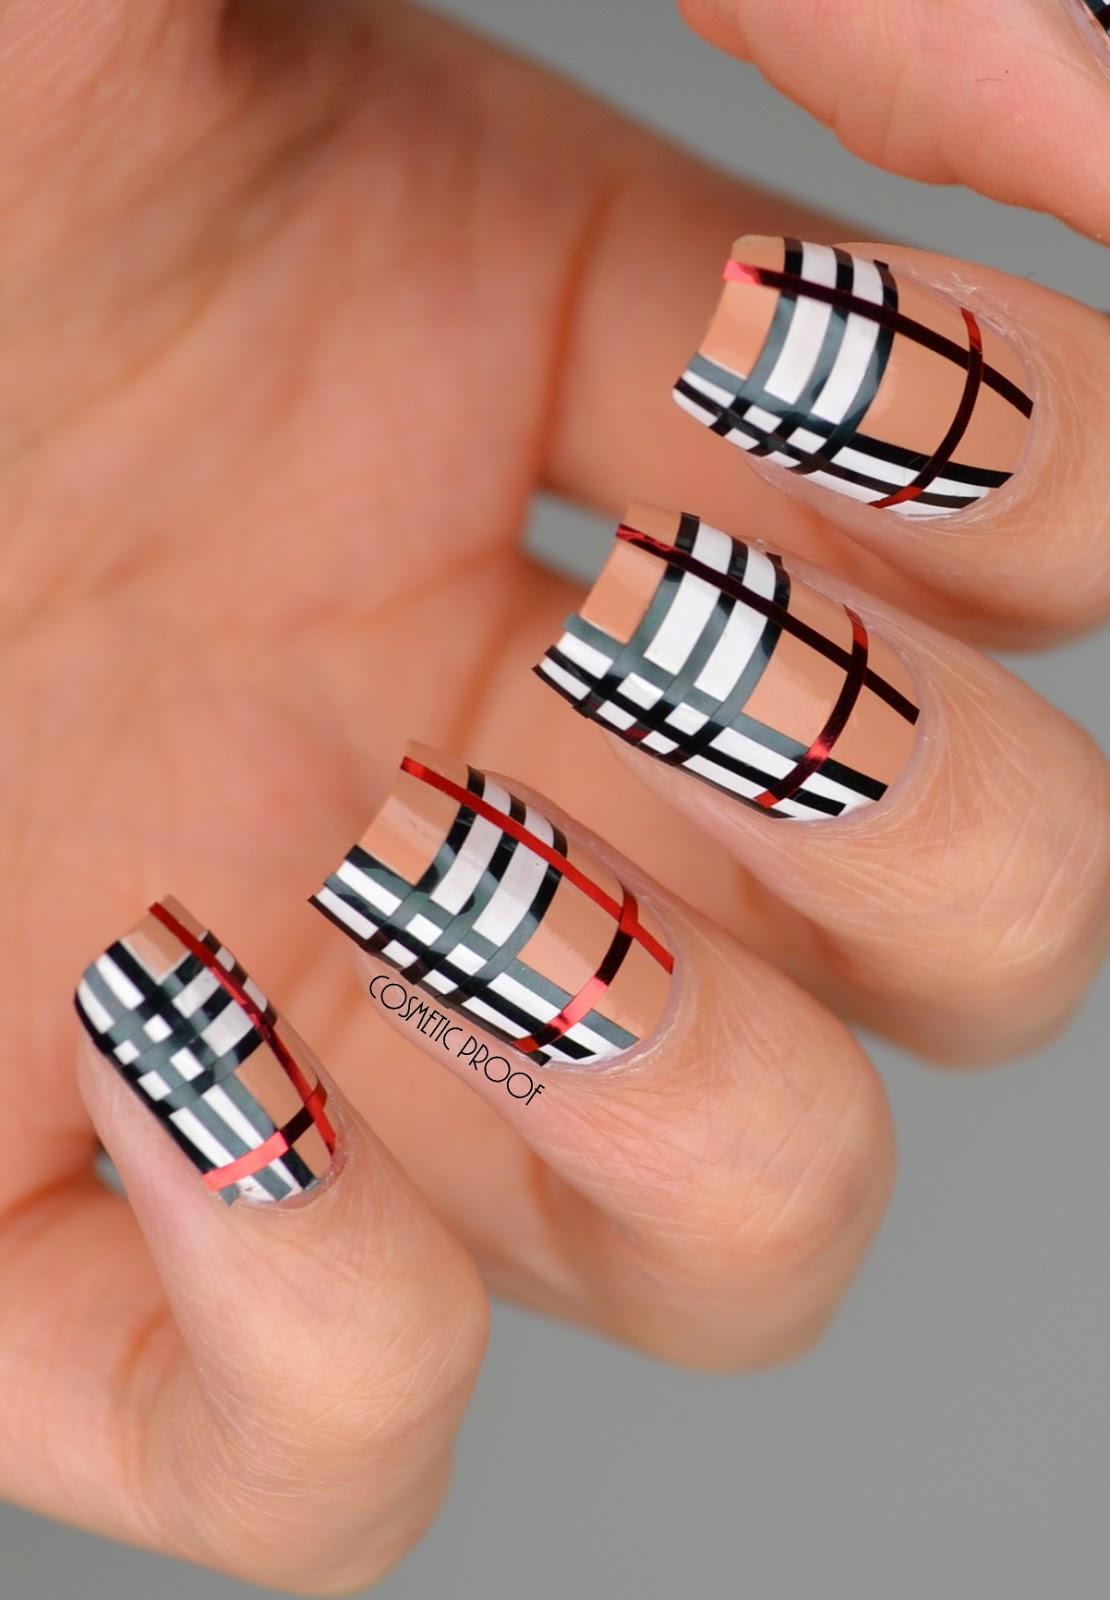 NAILS | Striping Tape Burberry Nail Art #CBBNov | Cosmetic ...